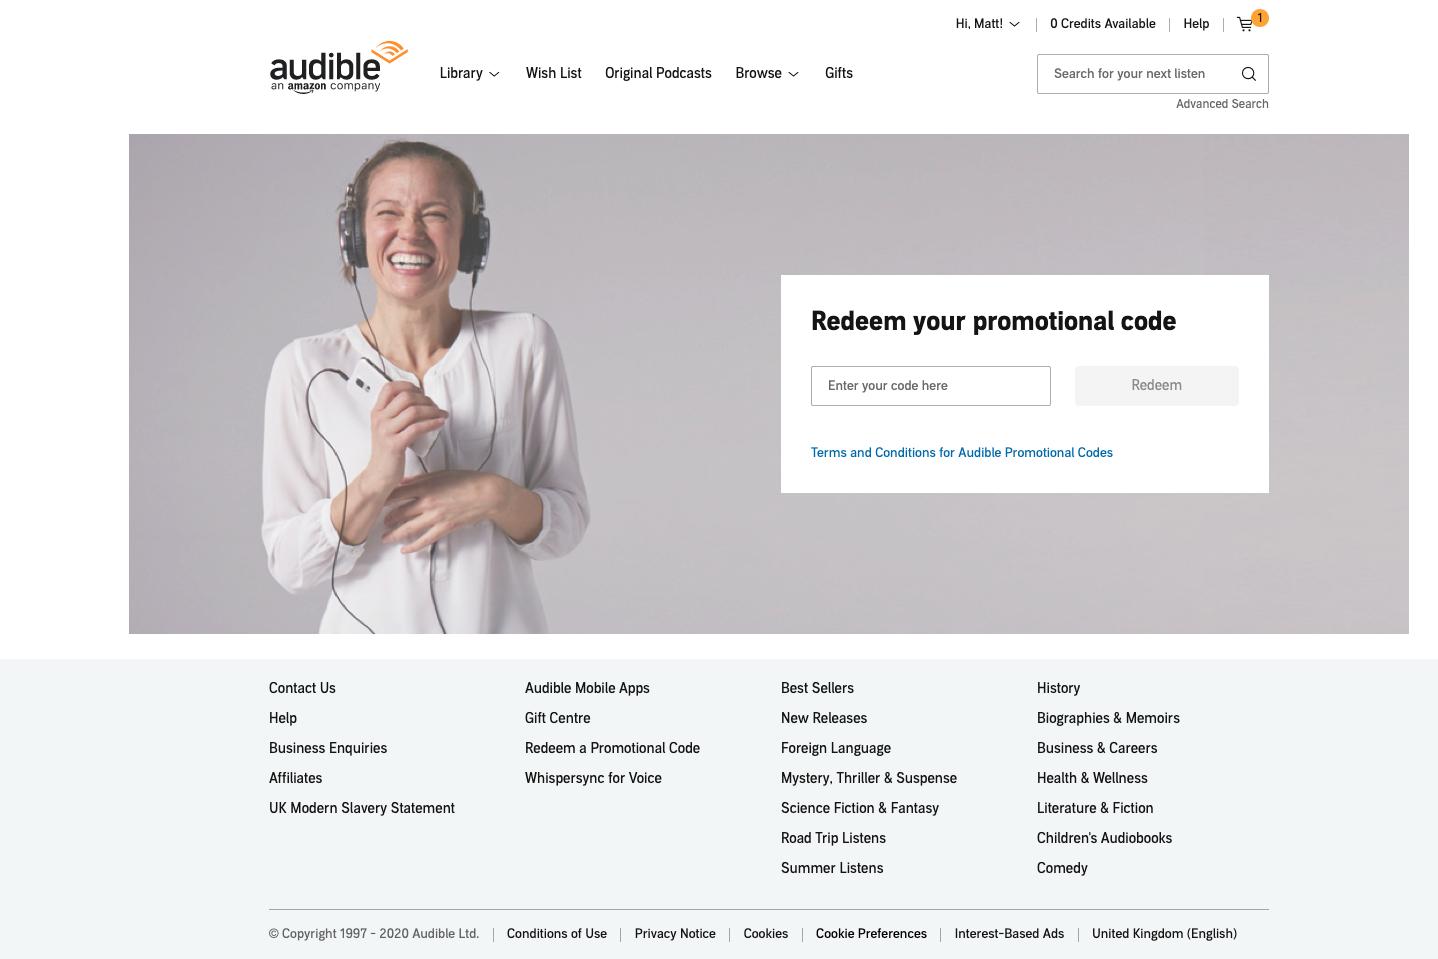 audible voucher-voucher_redemption-how-to